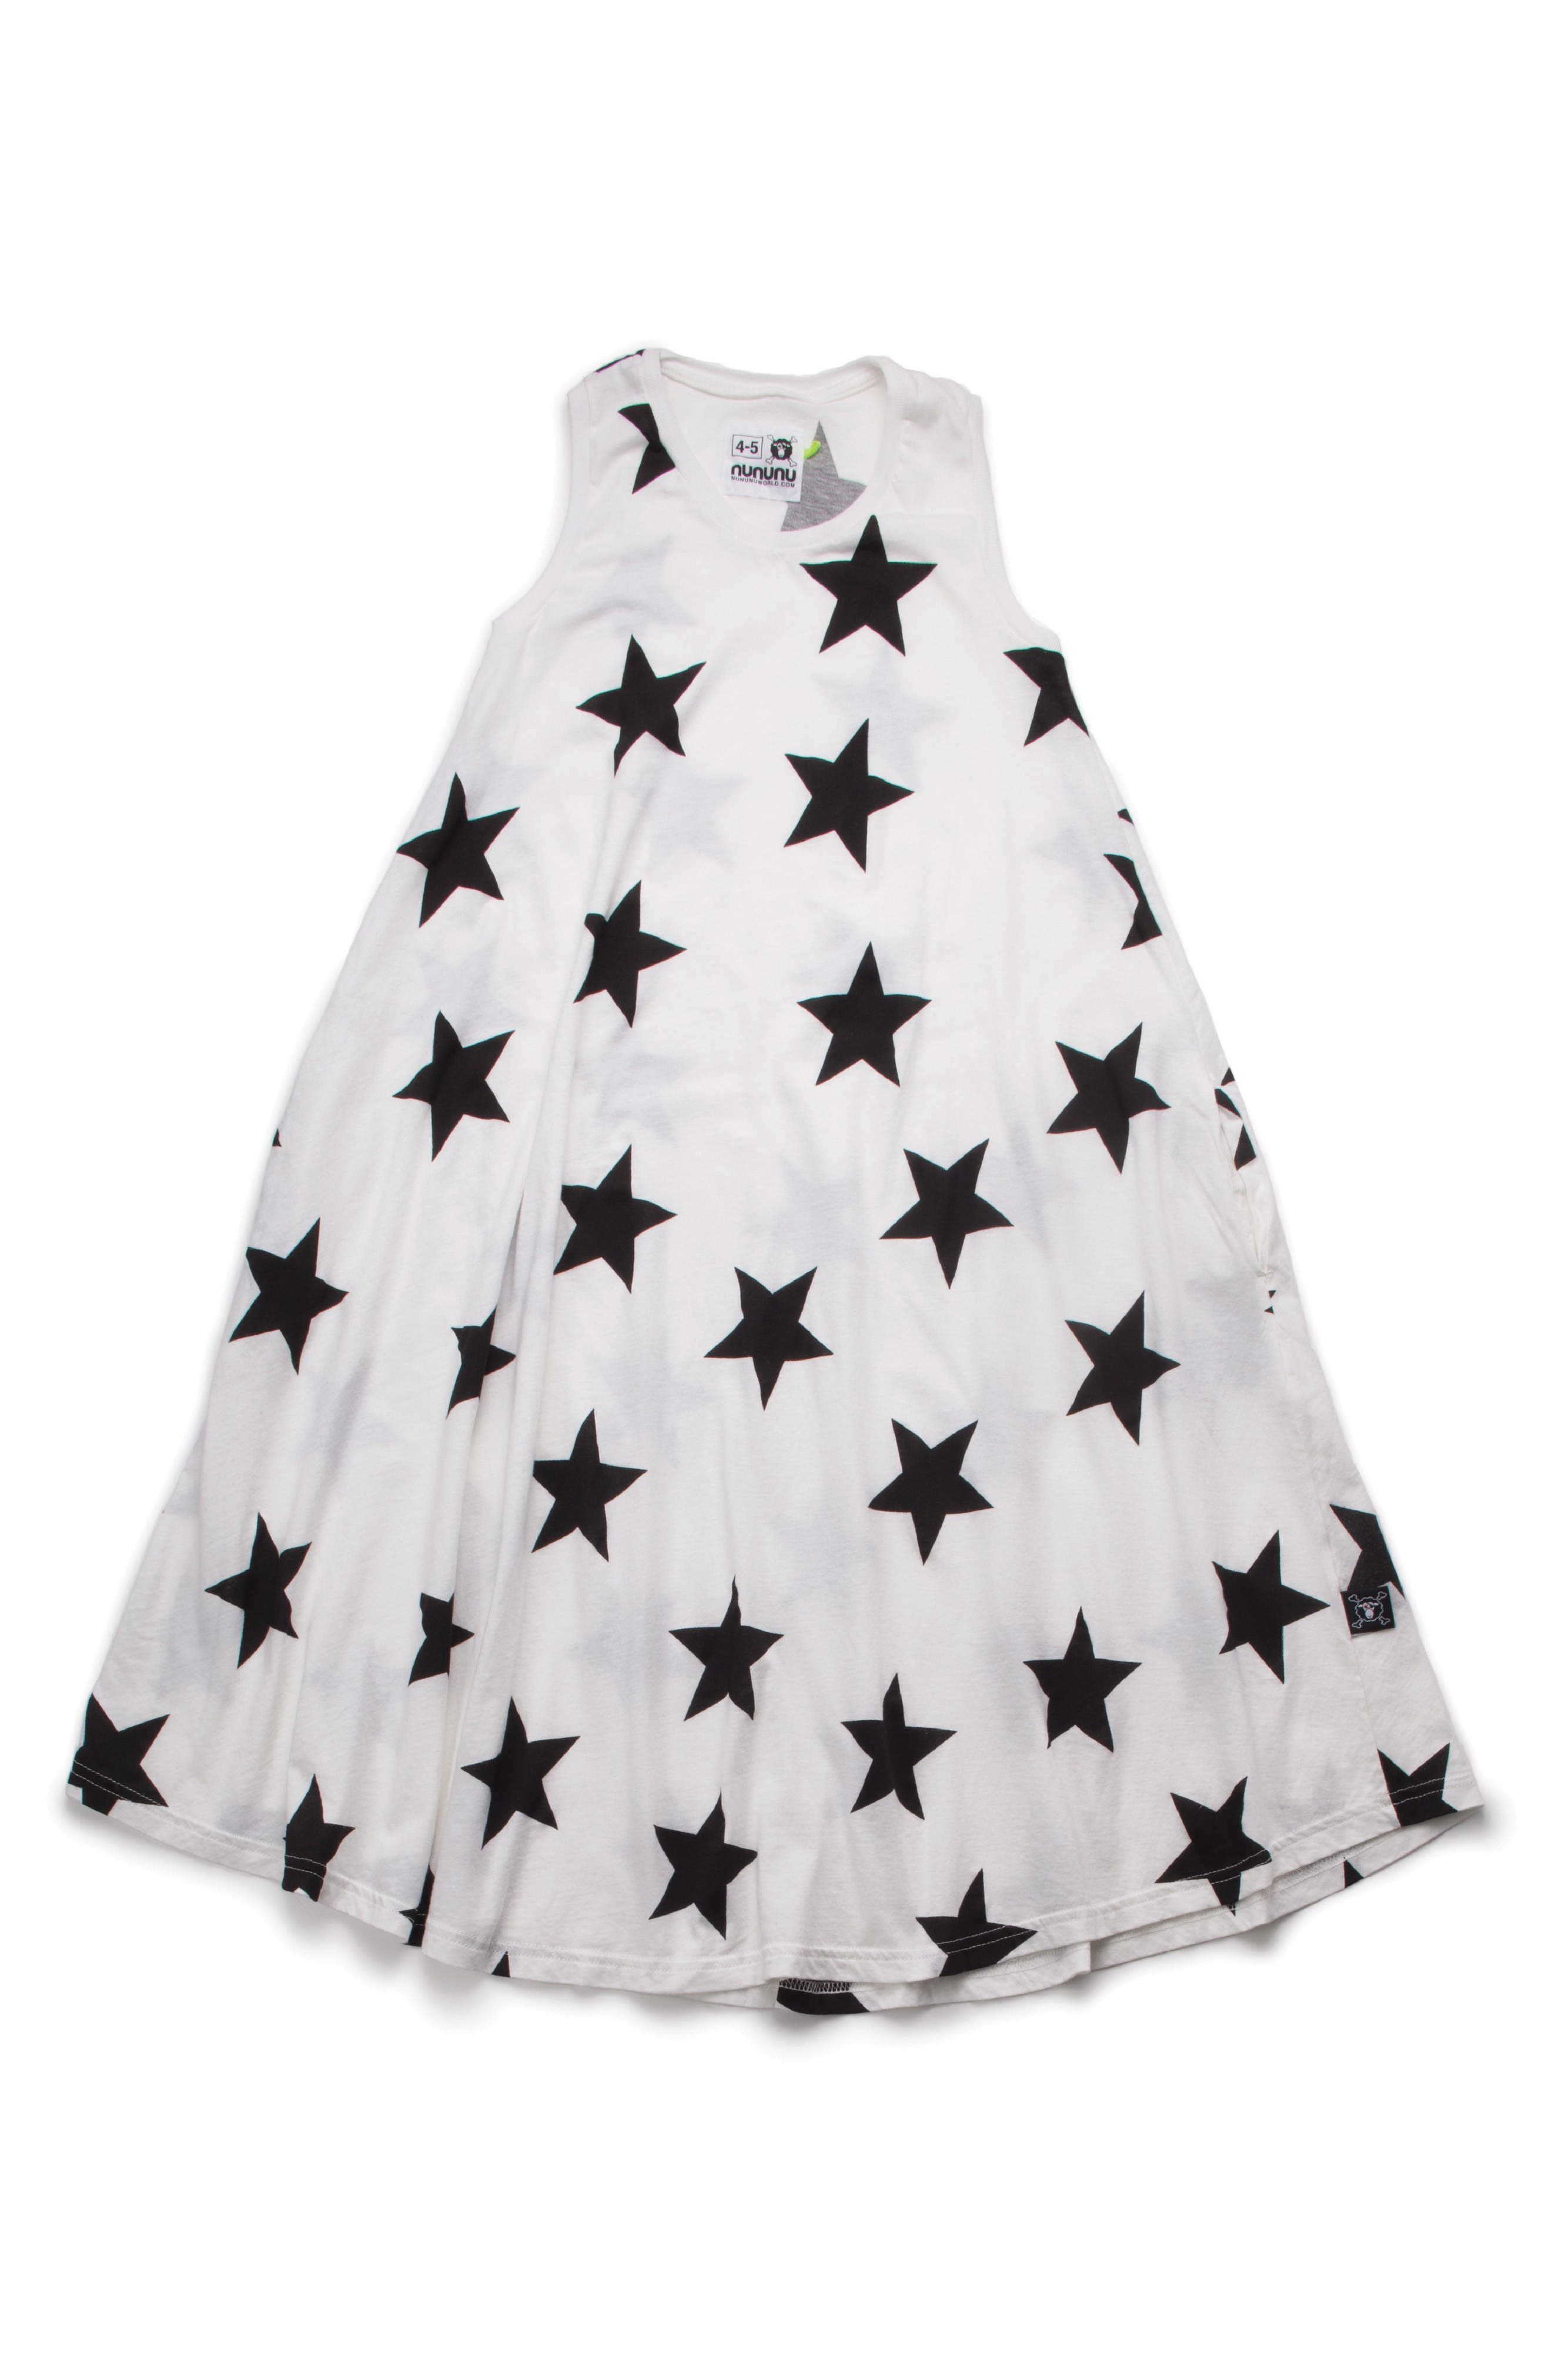 Alternate Image 1 Selected - NUNUNU Star Trapeze Dress (Toddler Girls & Little Girls)